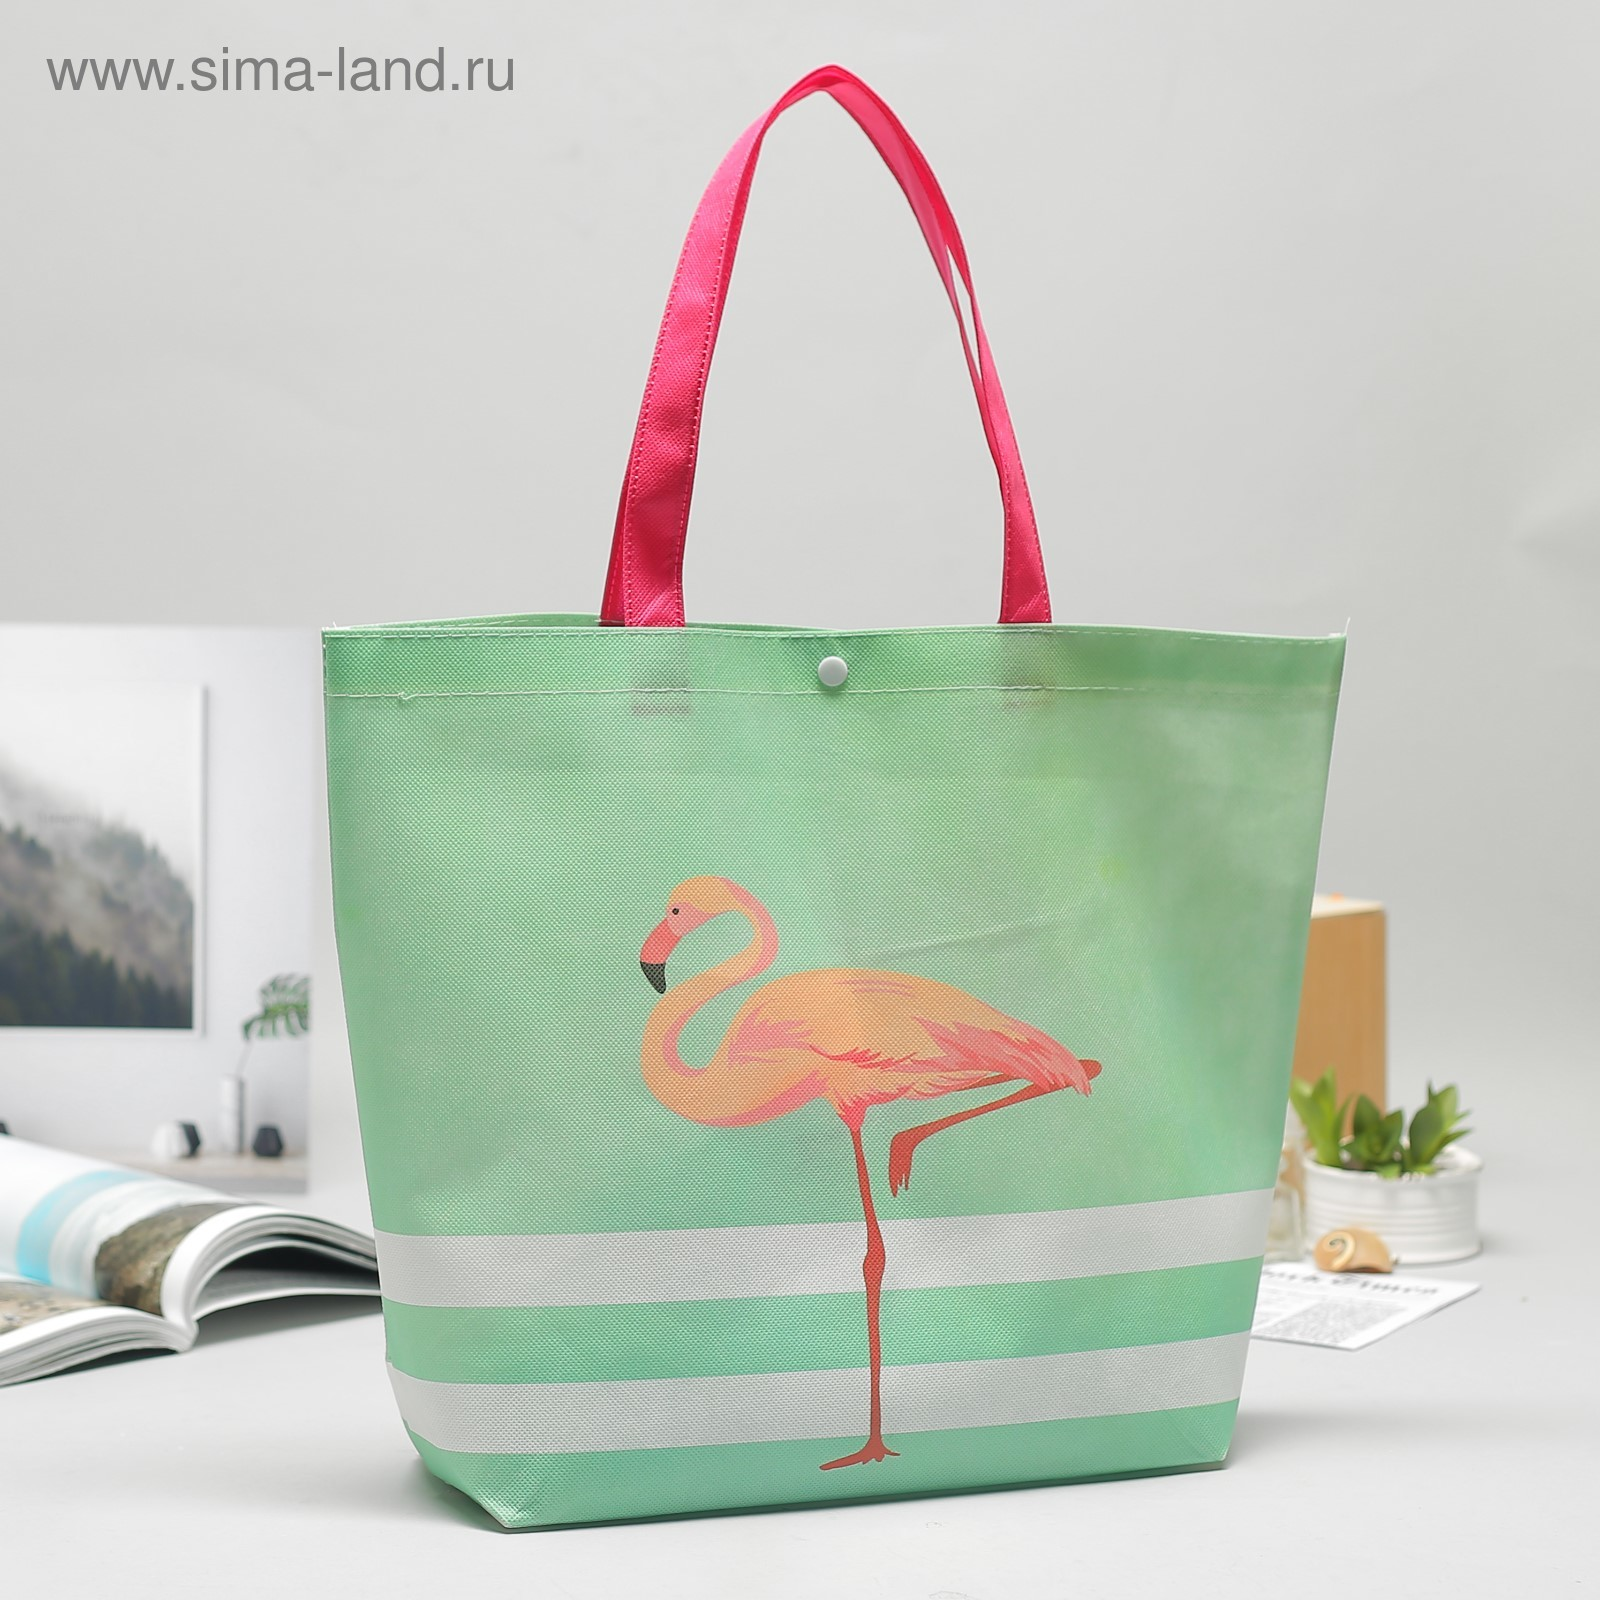 Сумка хозяйственная Фламинго мятный 42*1*36см